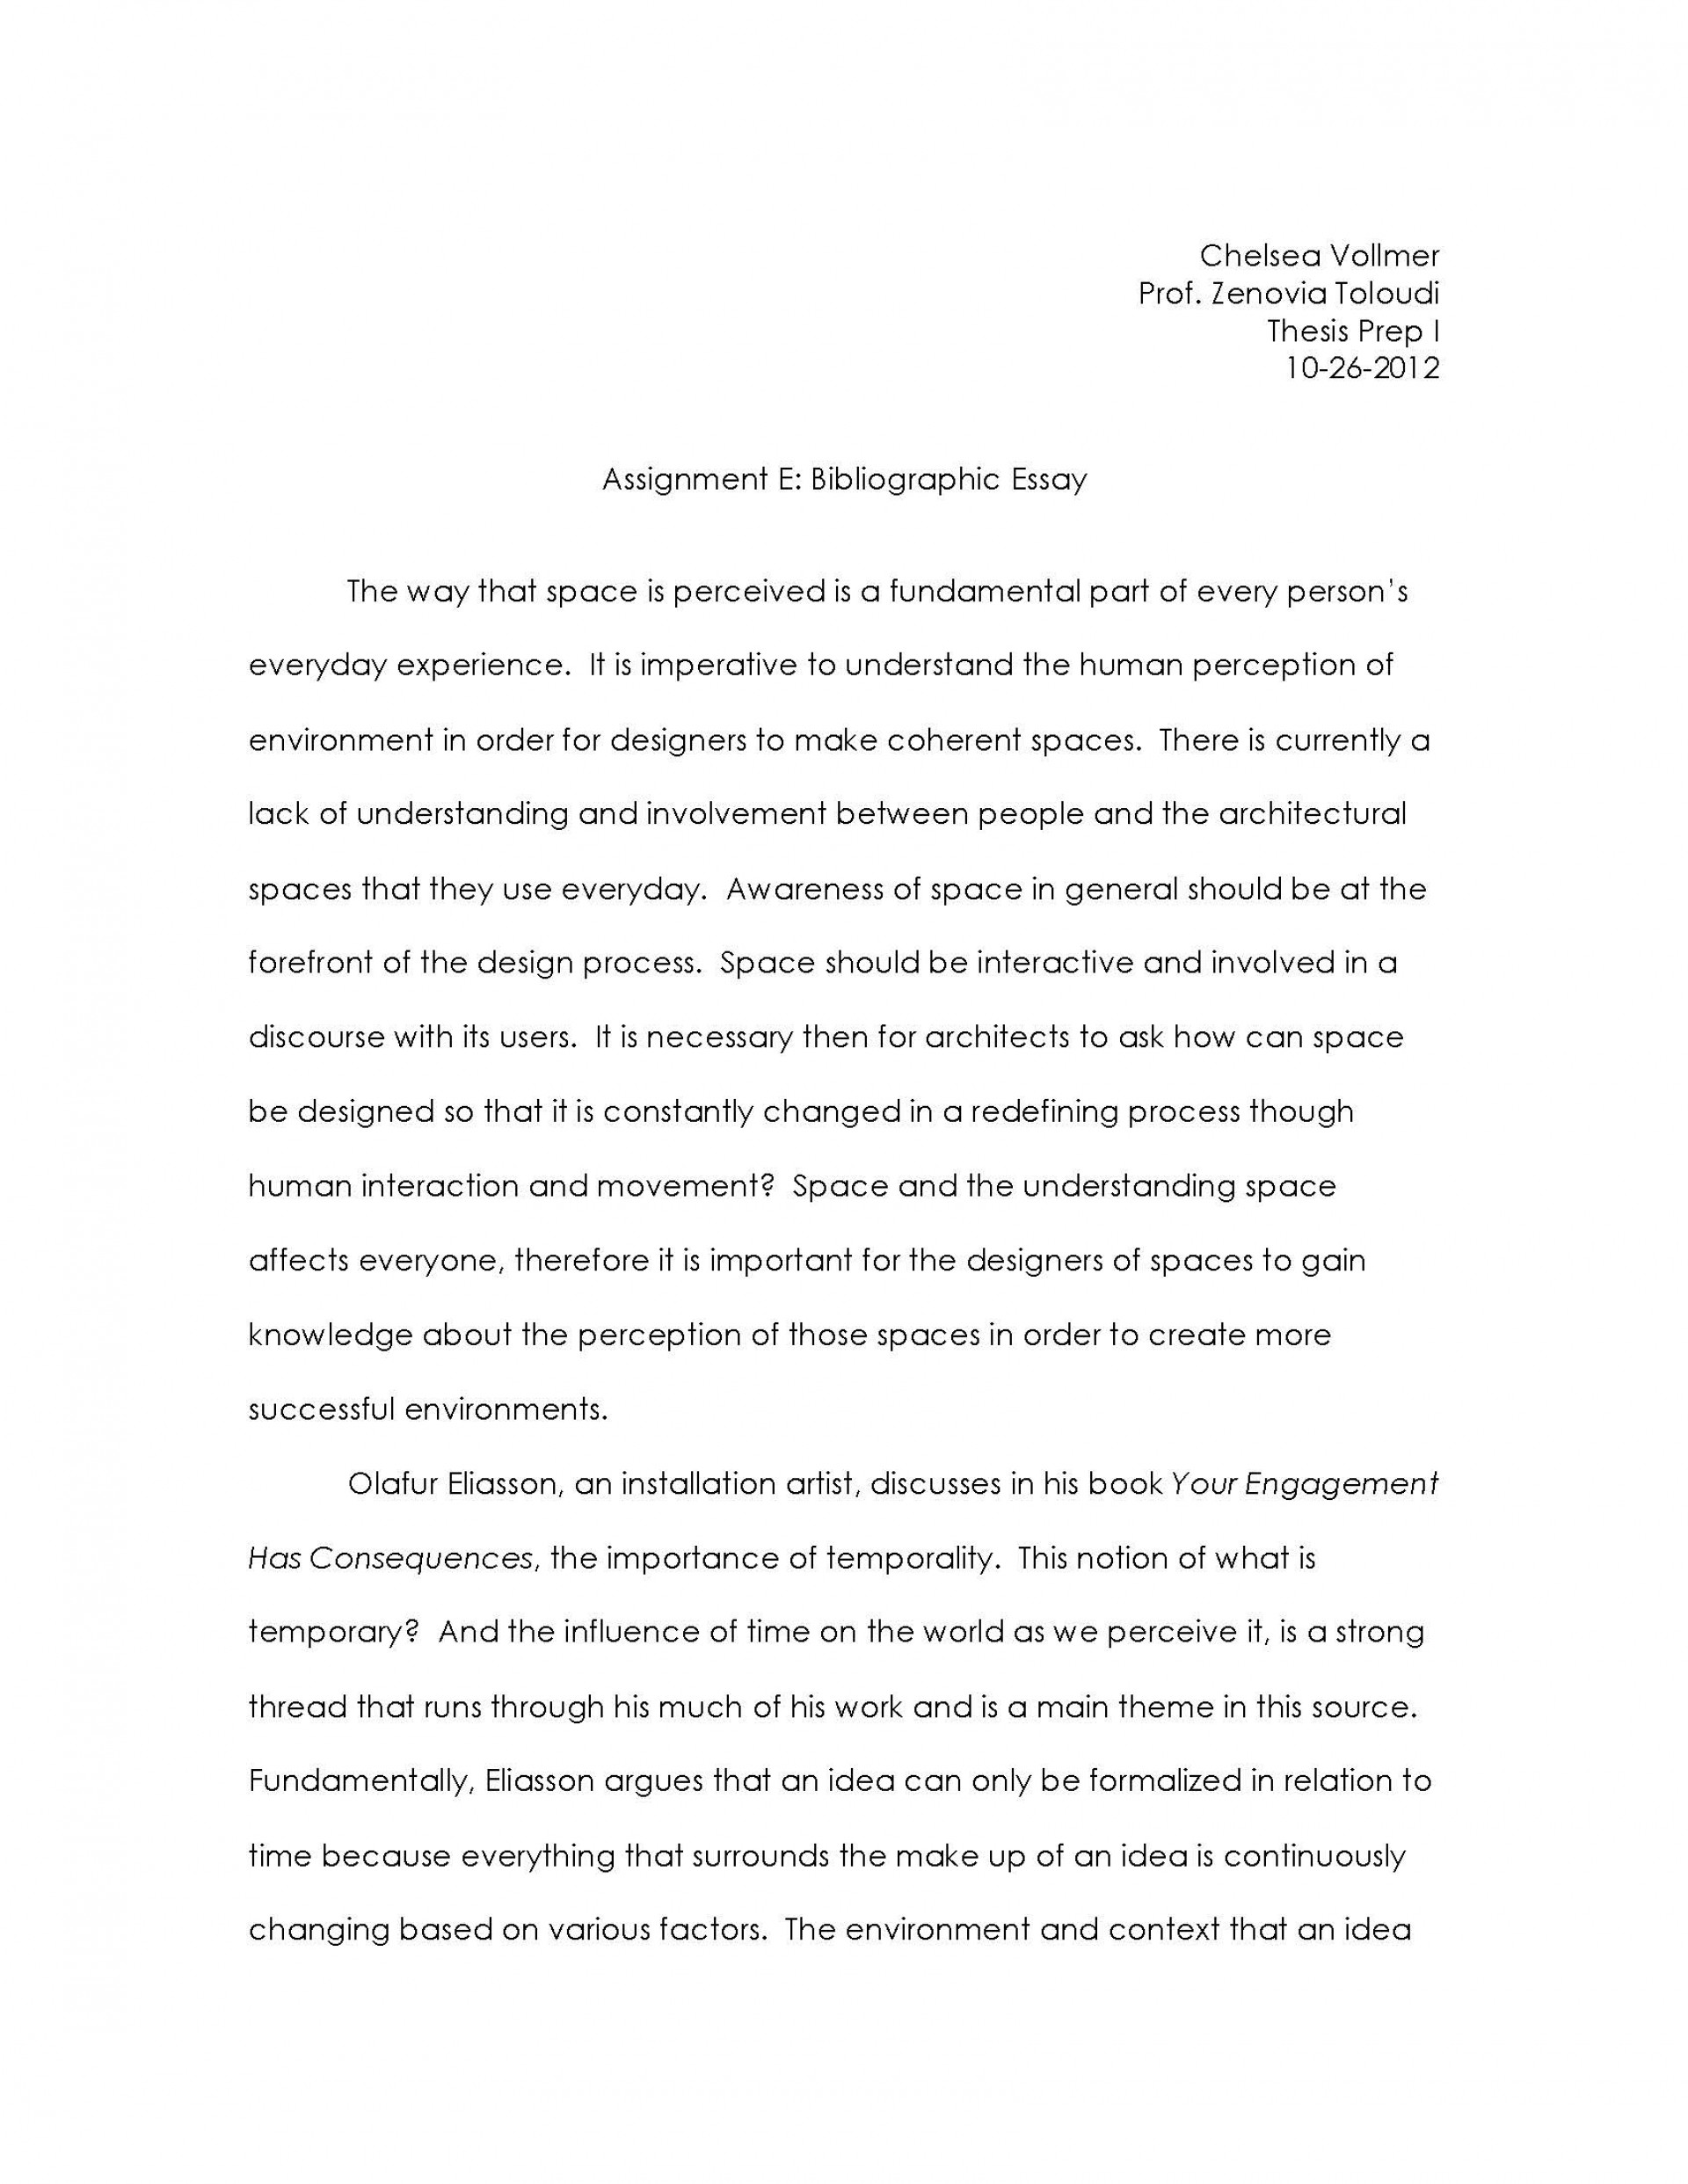 Help writing satirical essay